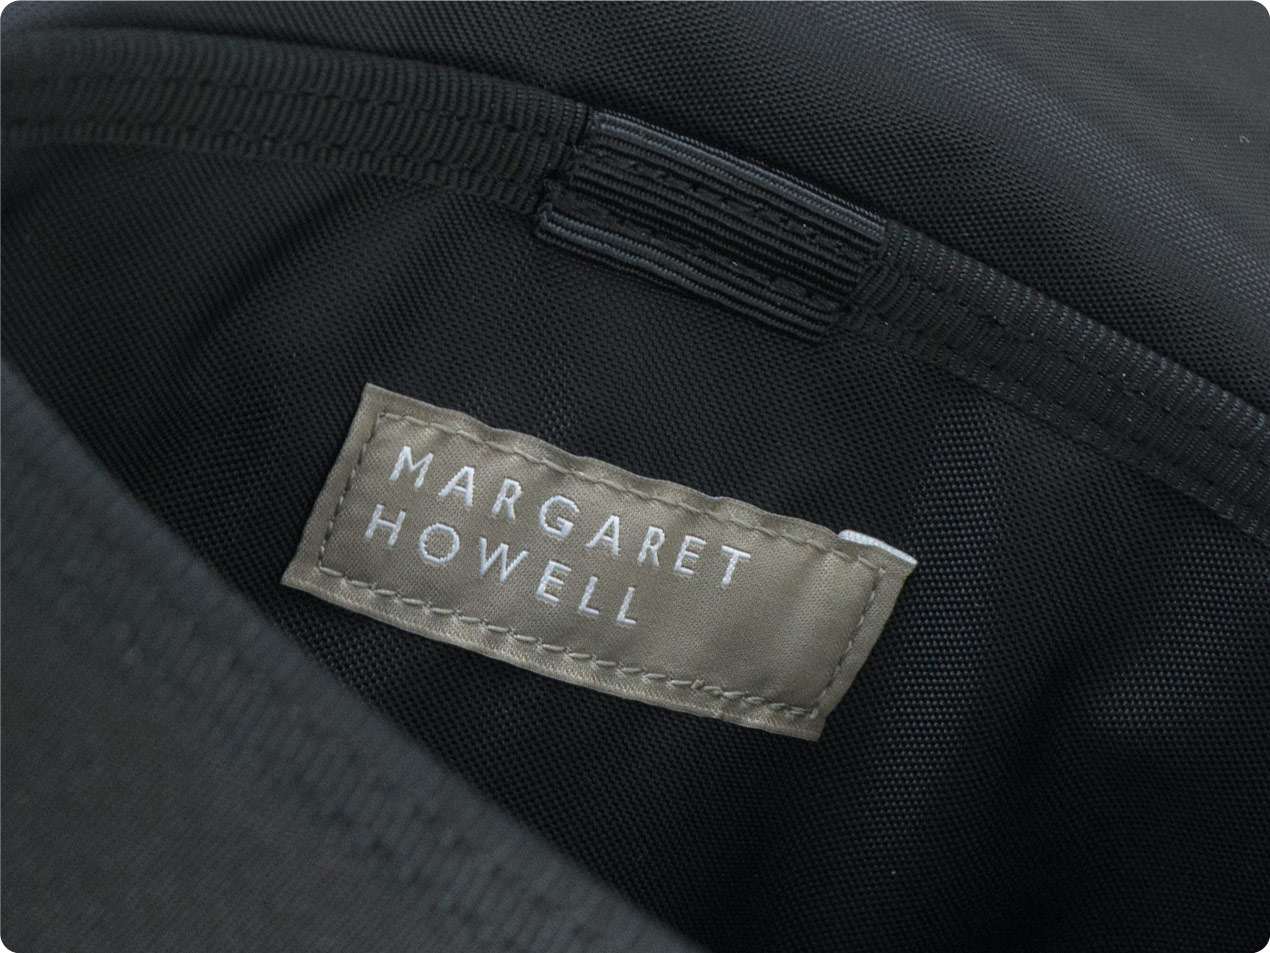 MARGARET HOWELL x PORTER CORDURA CANVAS POUCH